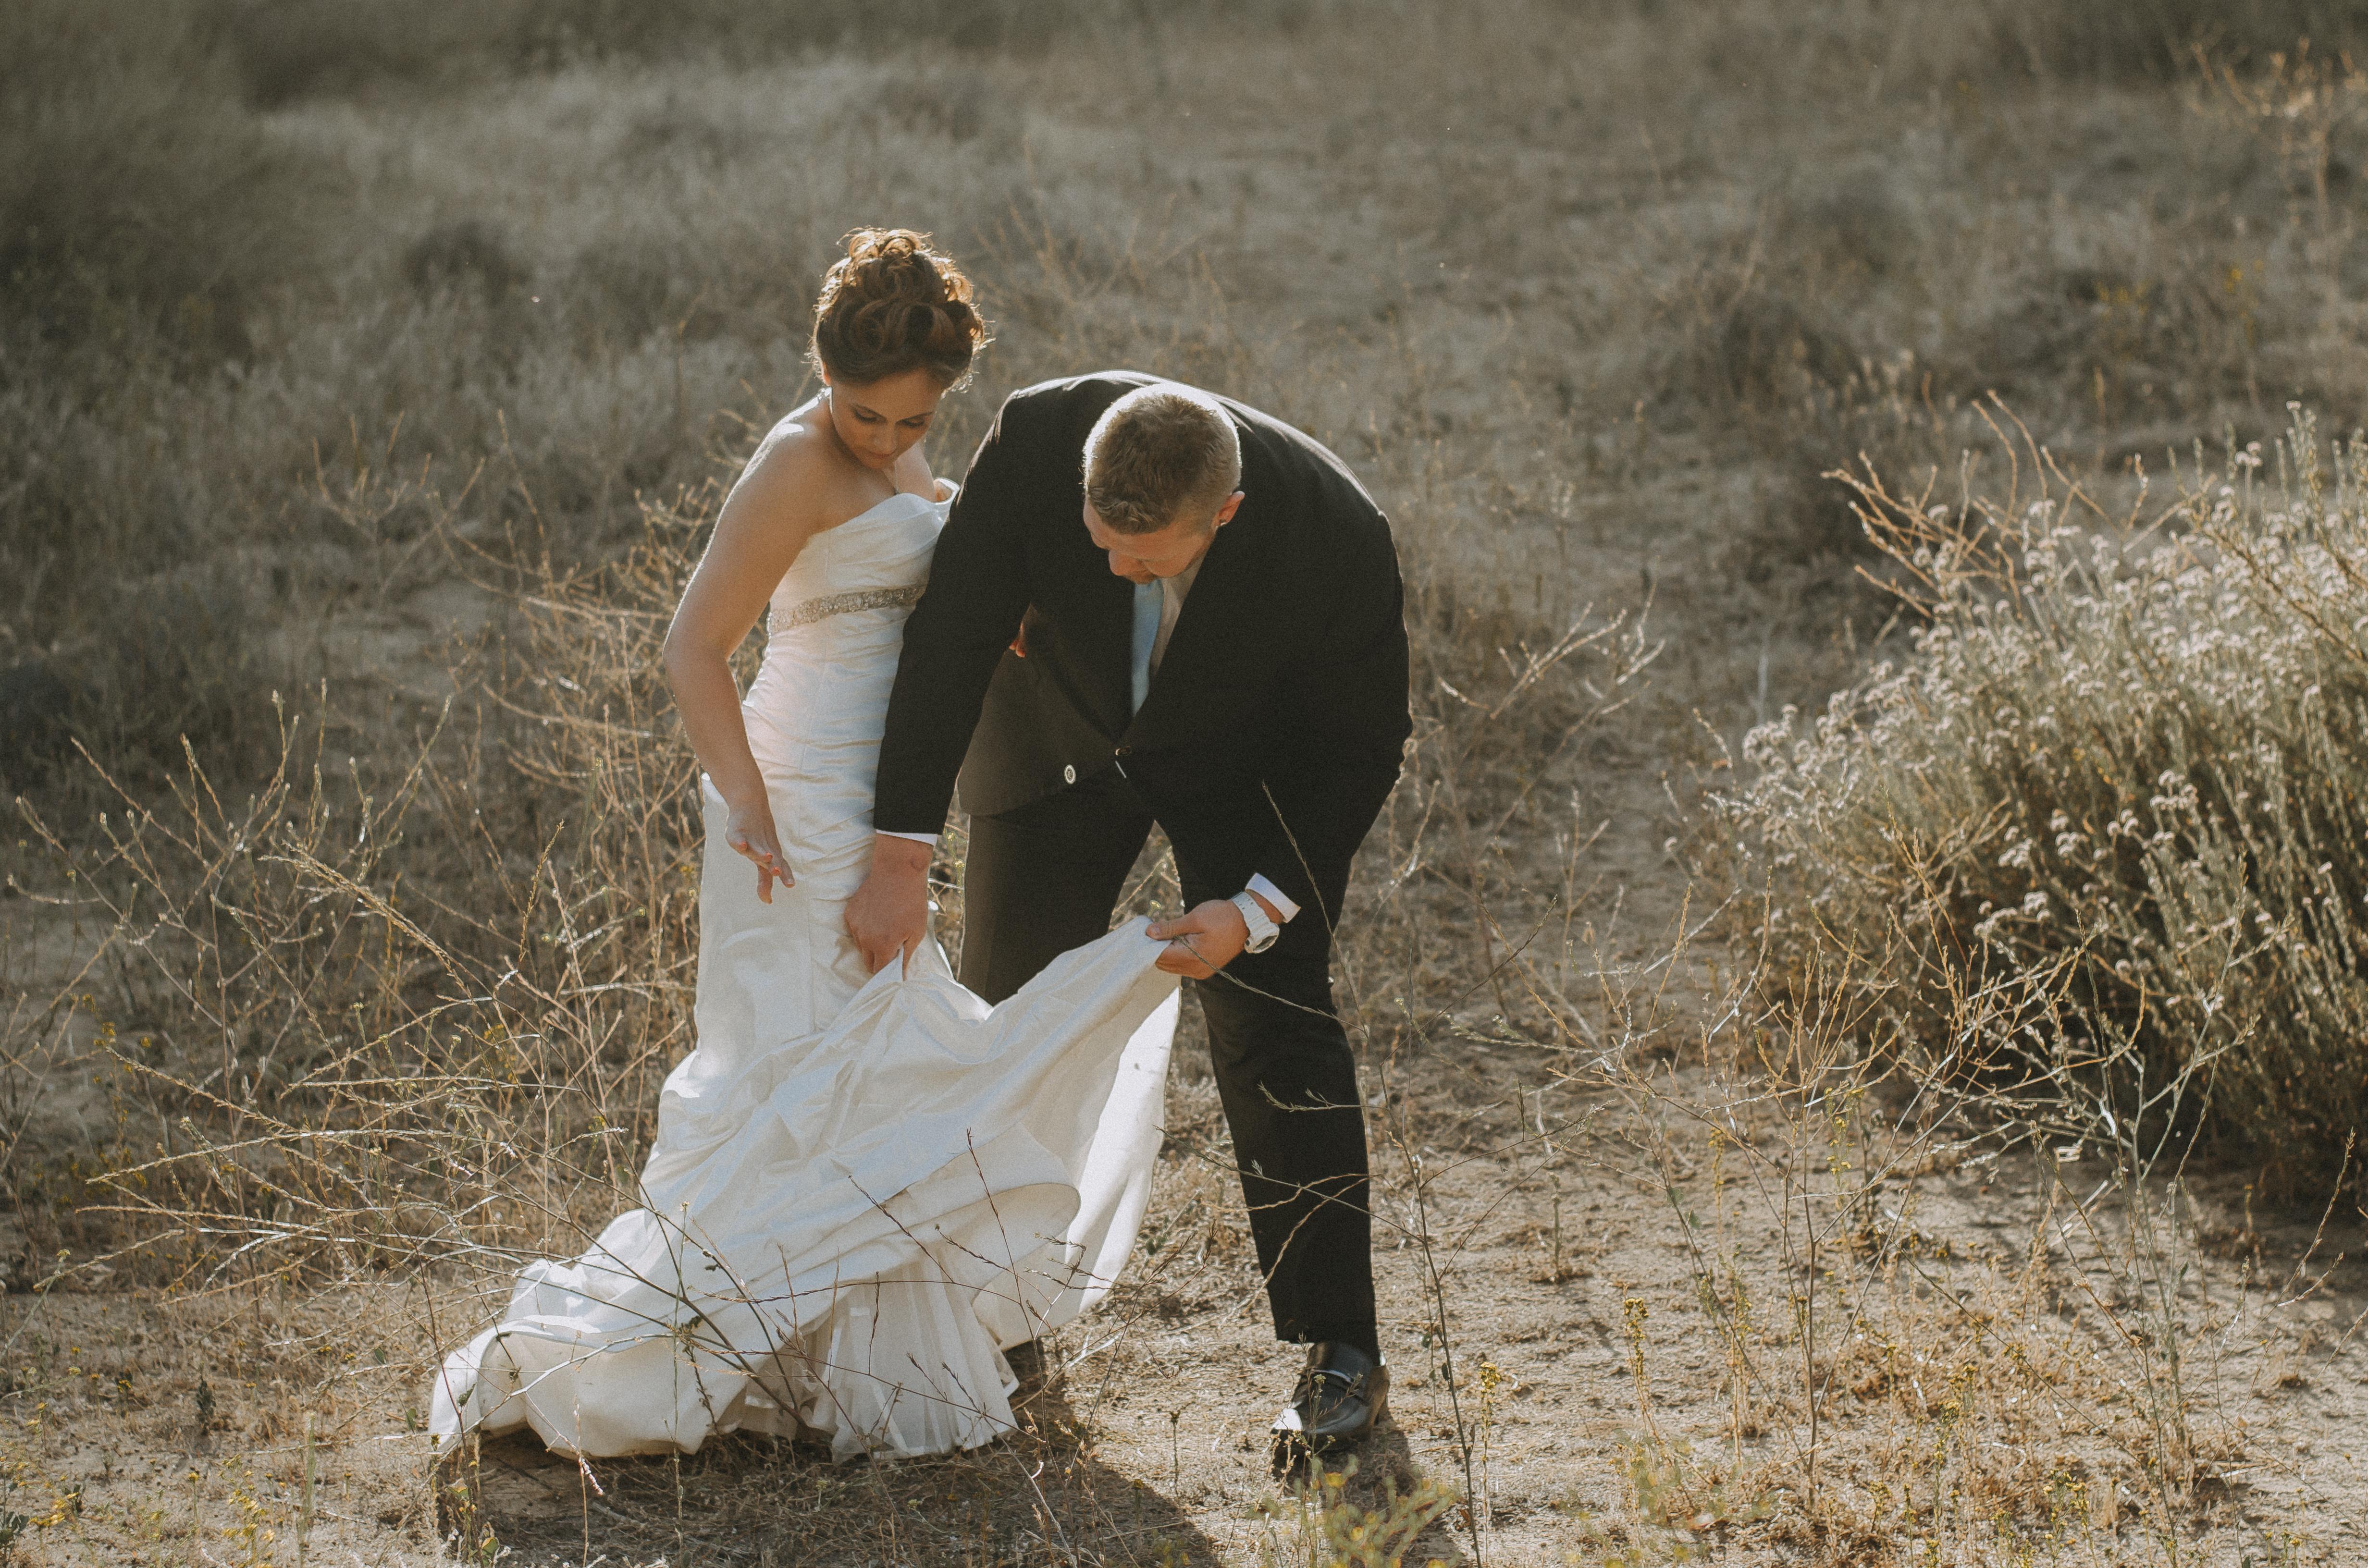 los angeles wedding photographer, simi valley wedding photographer, wedding photographers in los angeles